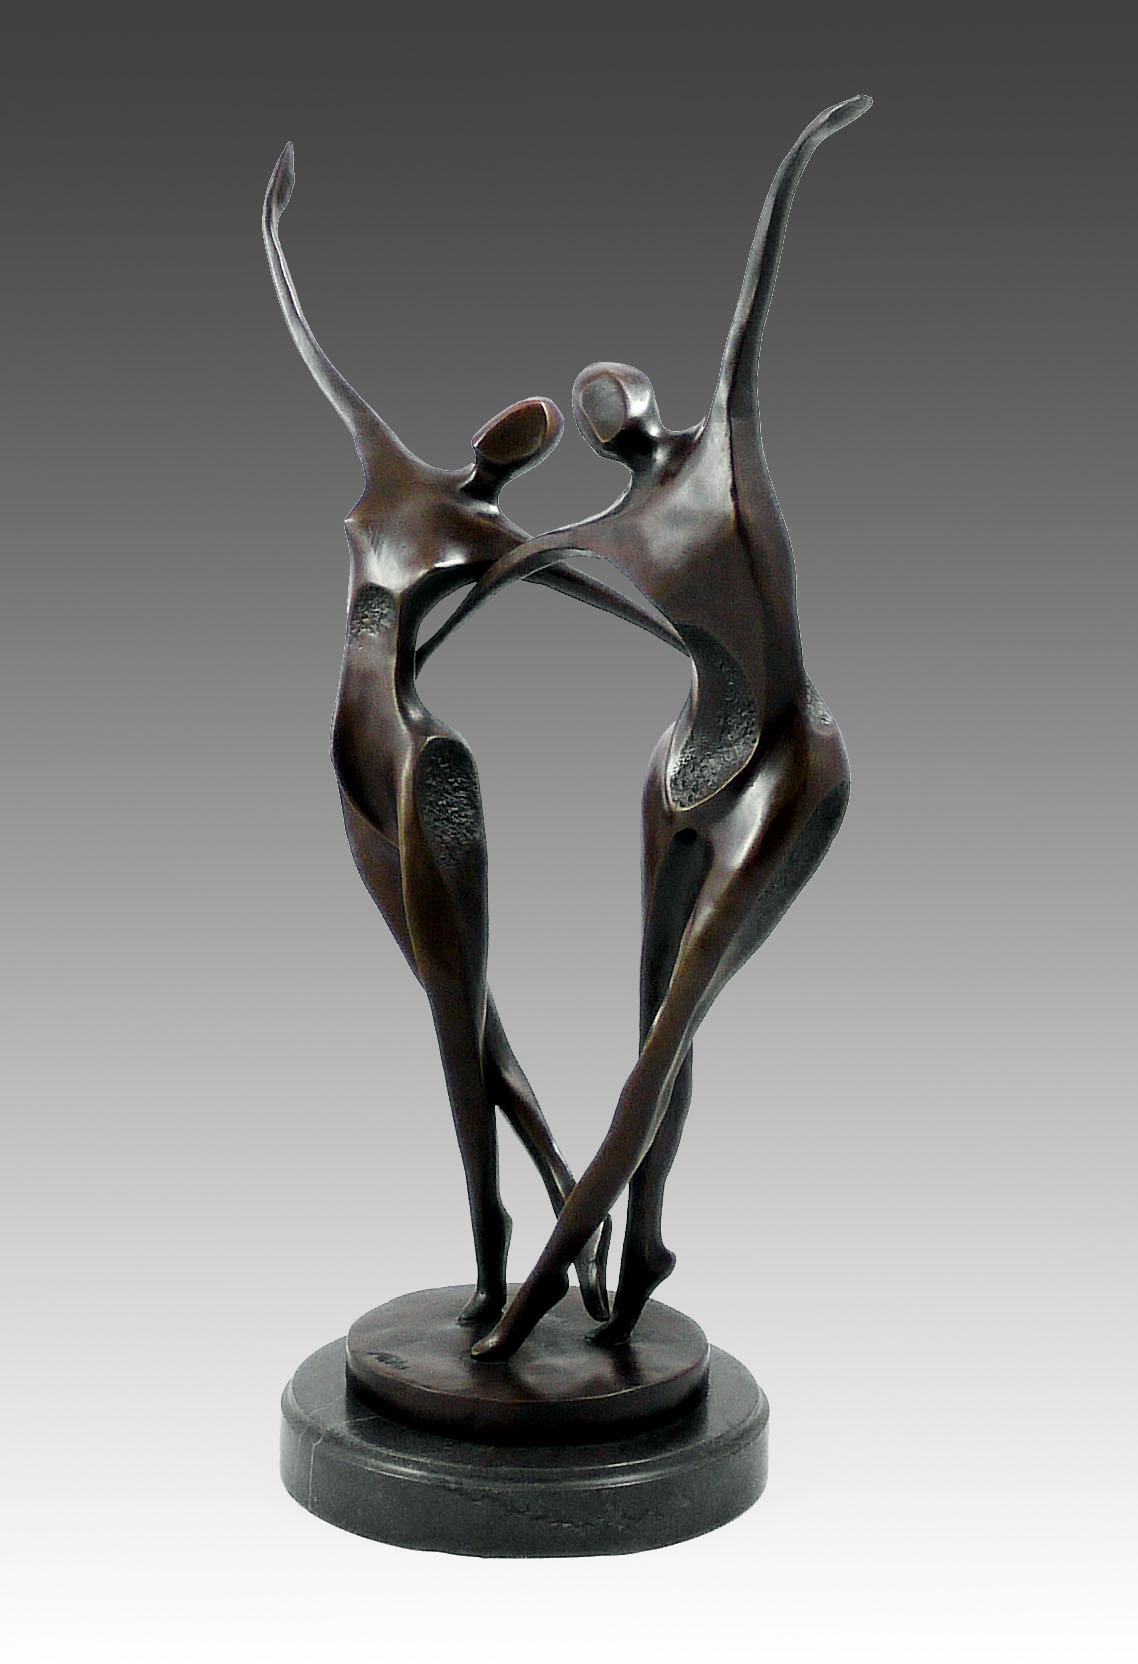 Fairy Daydream Bronze Sculpture Figure By French Artist